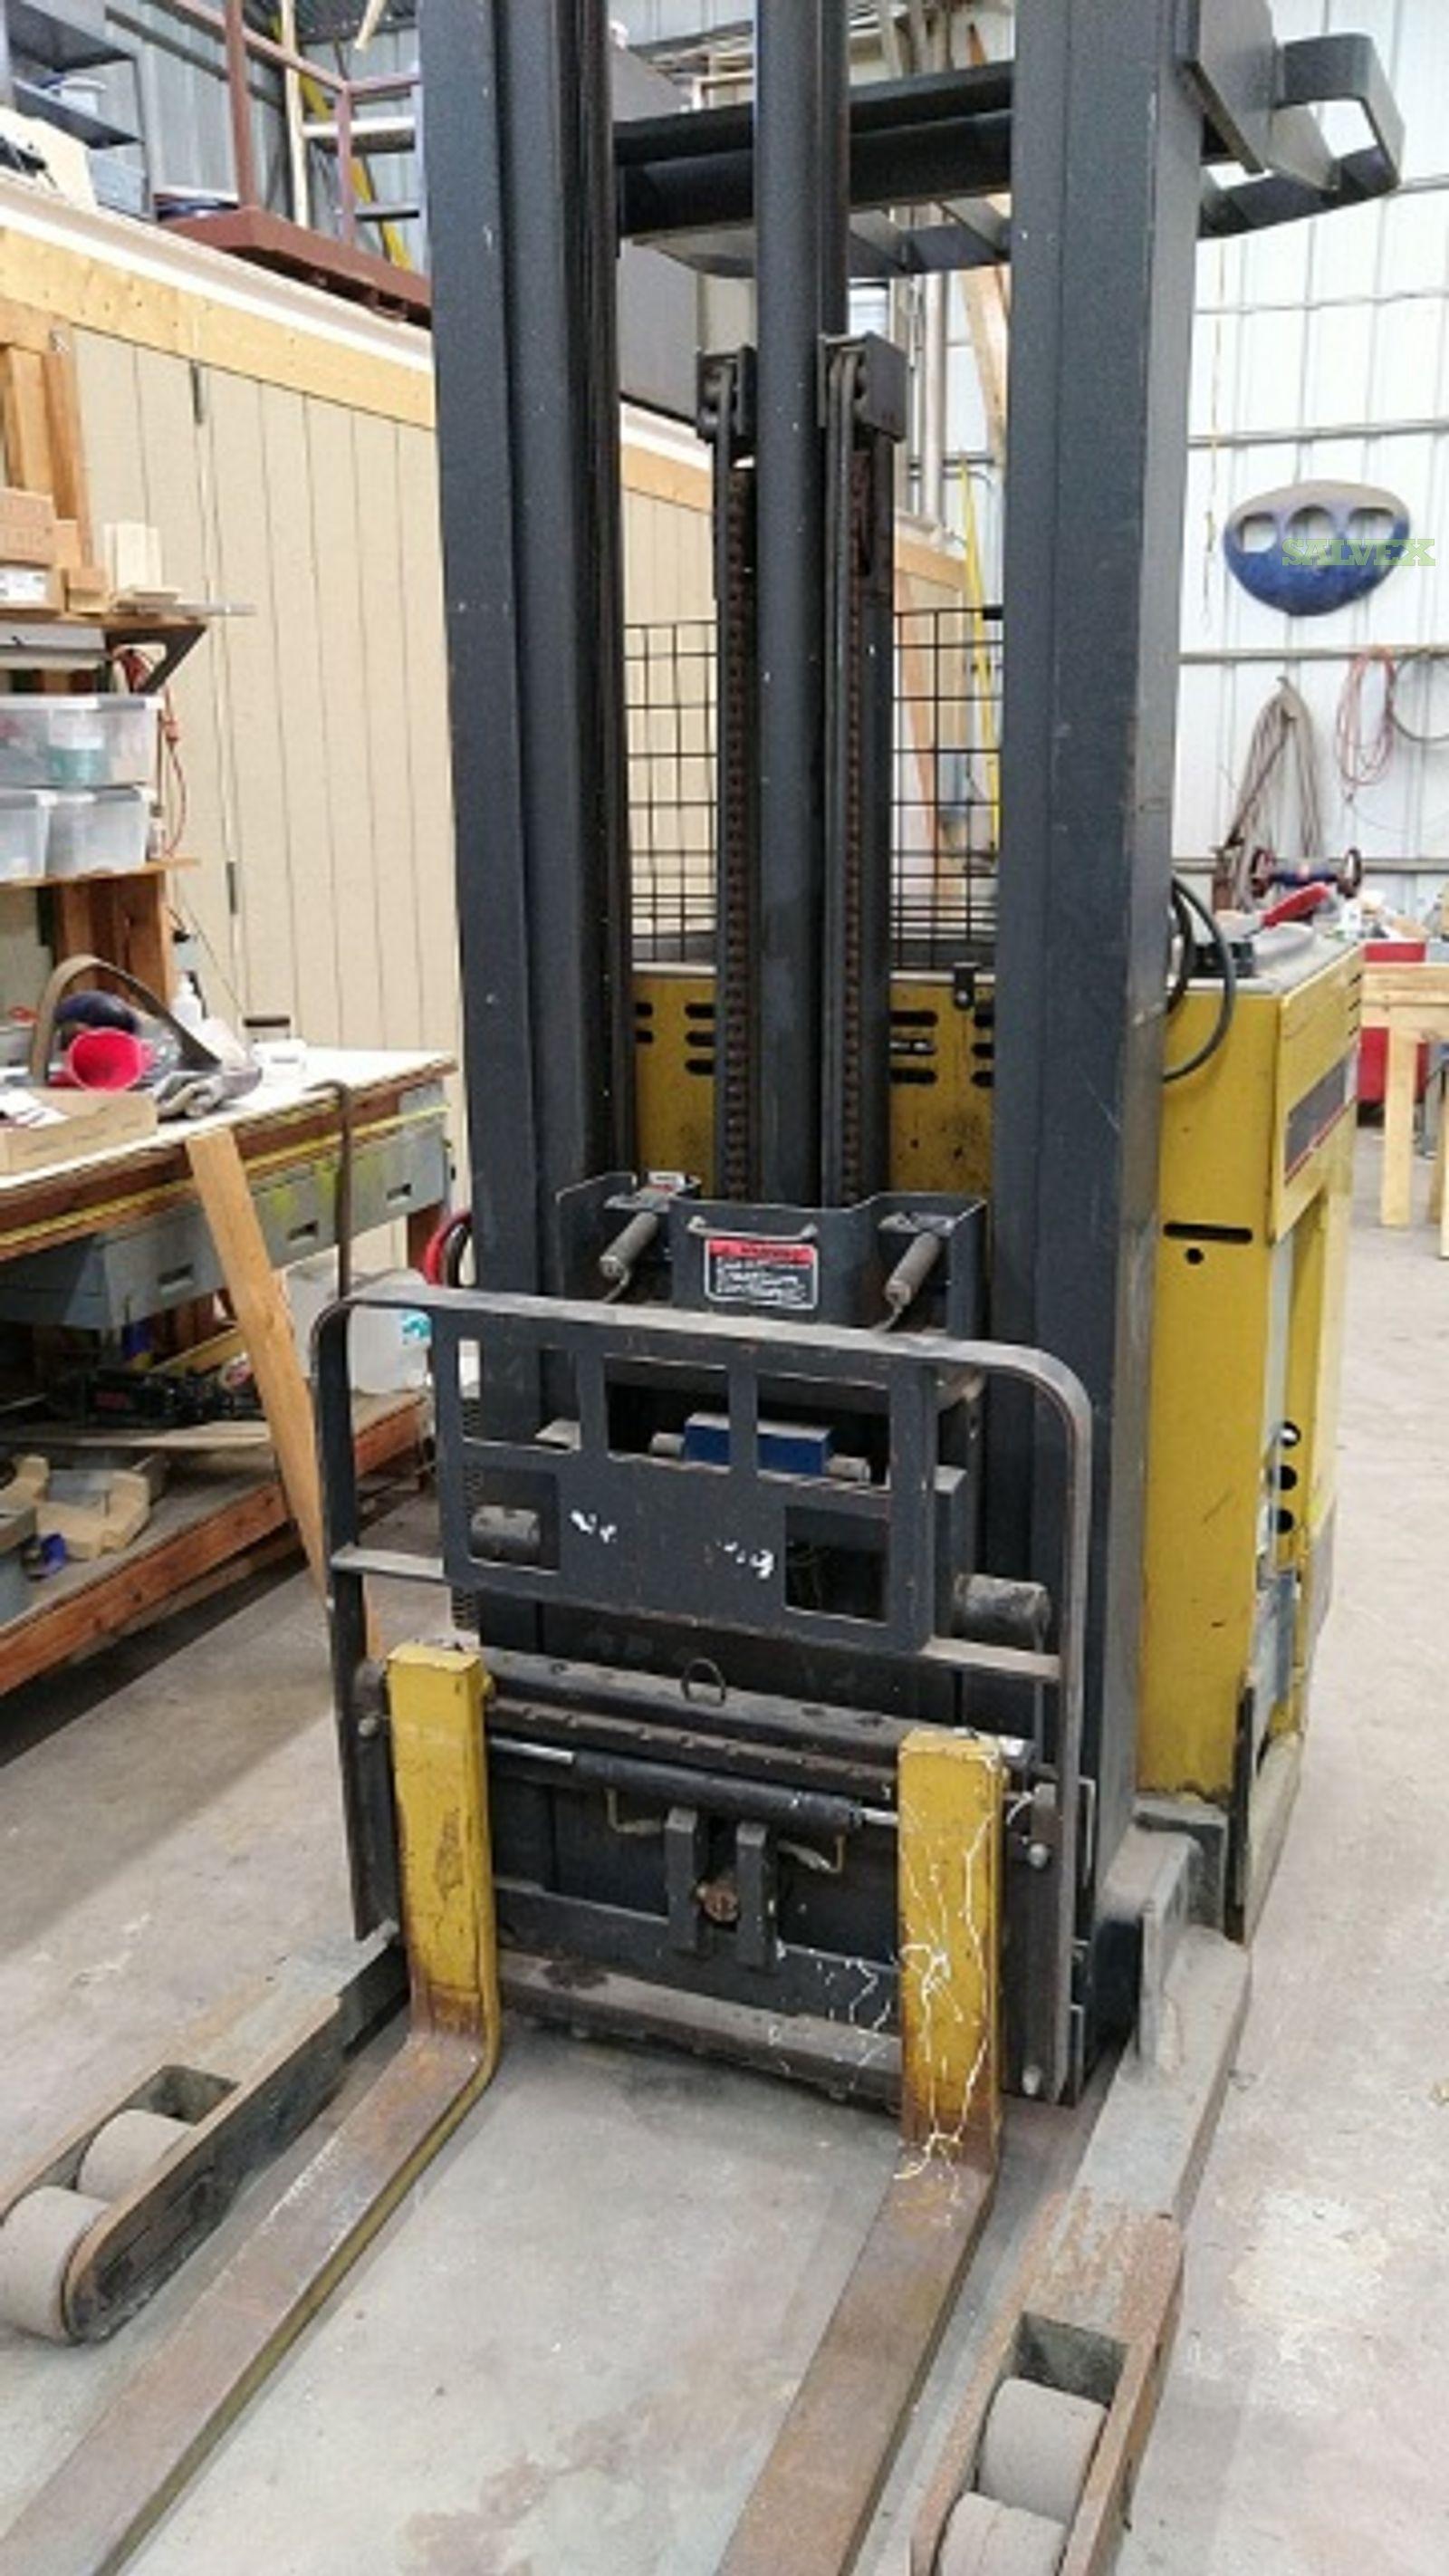 Caterpillar electric forklift NRR40